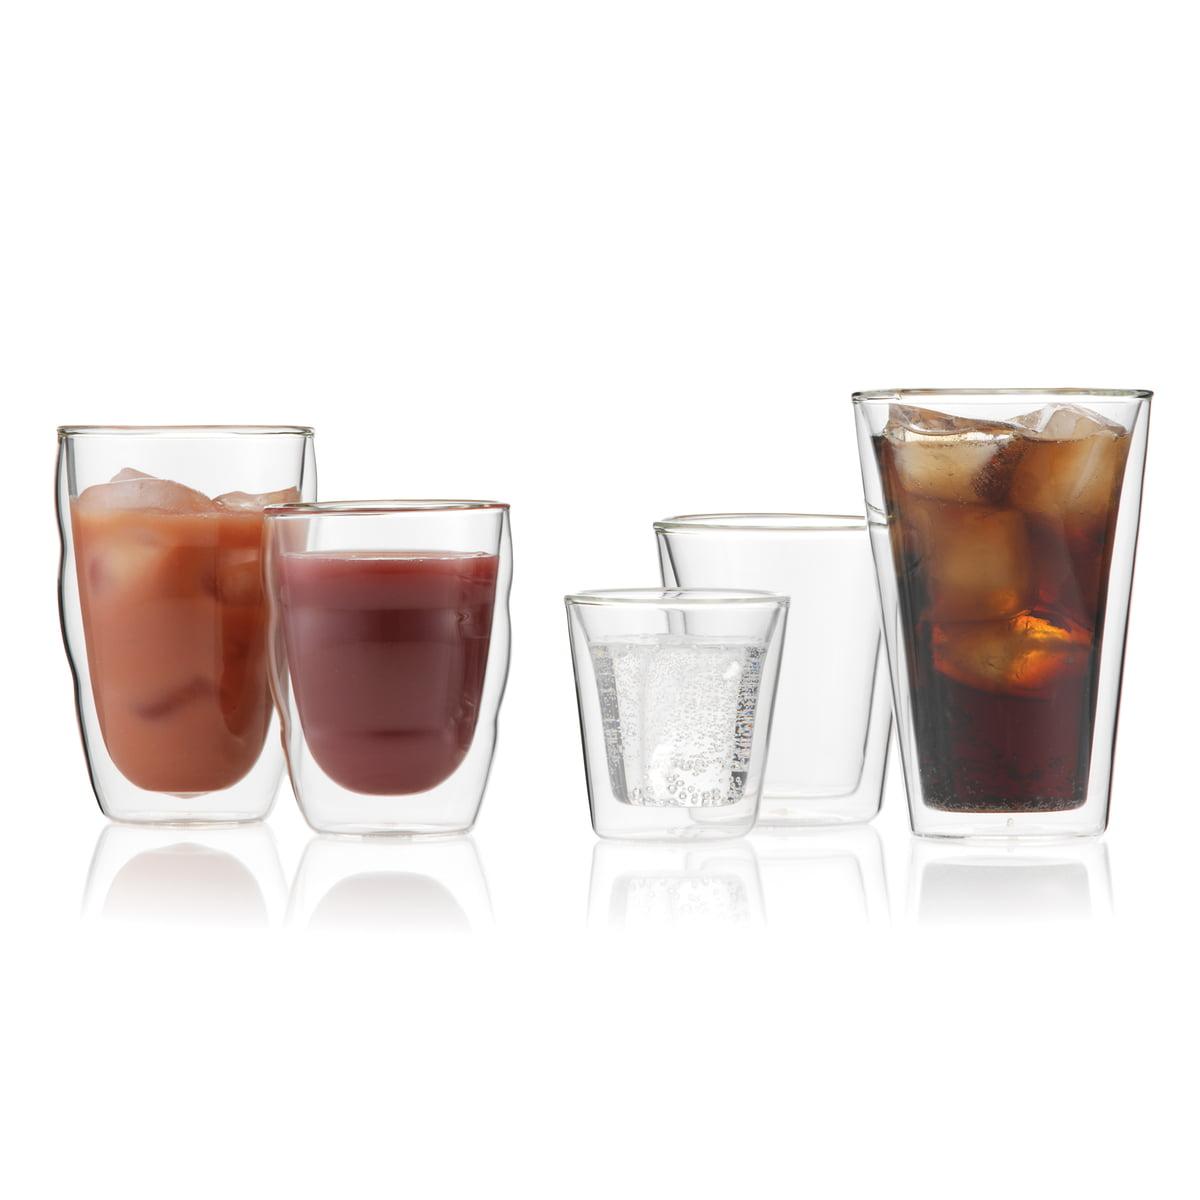 Best Drinking Glasses For Dishwasher